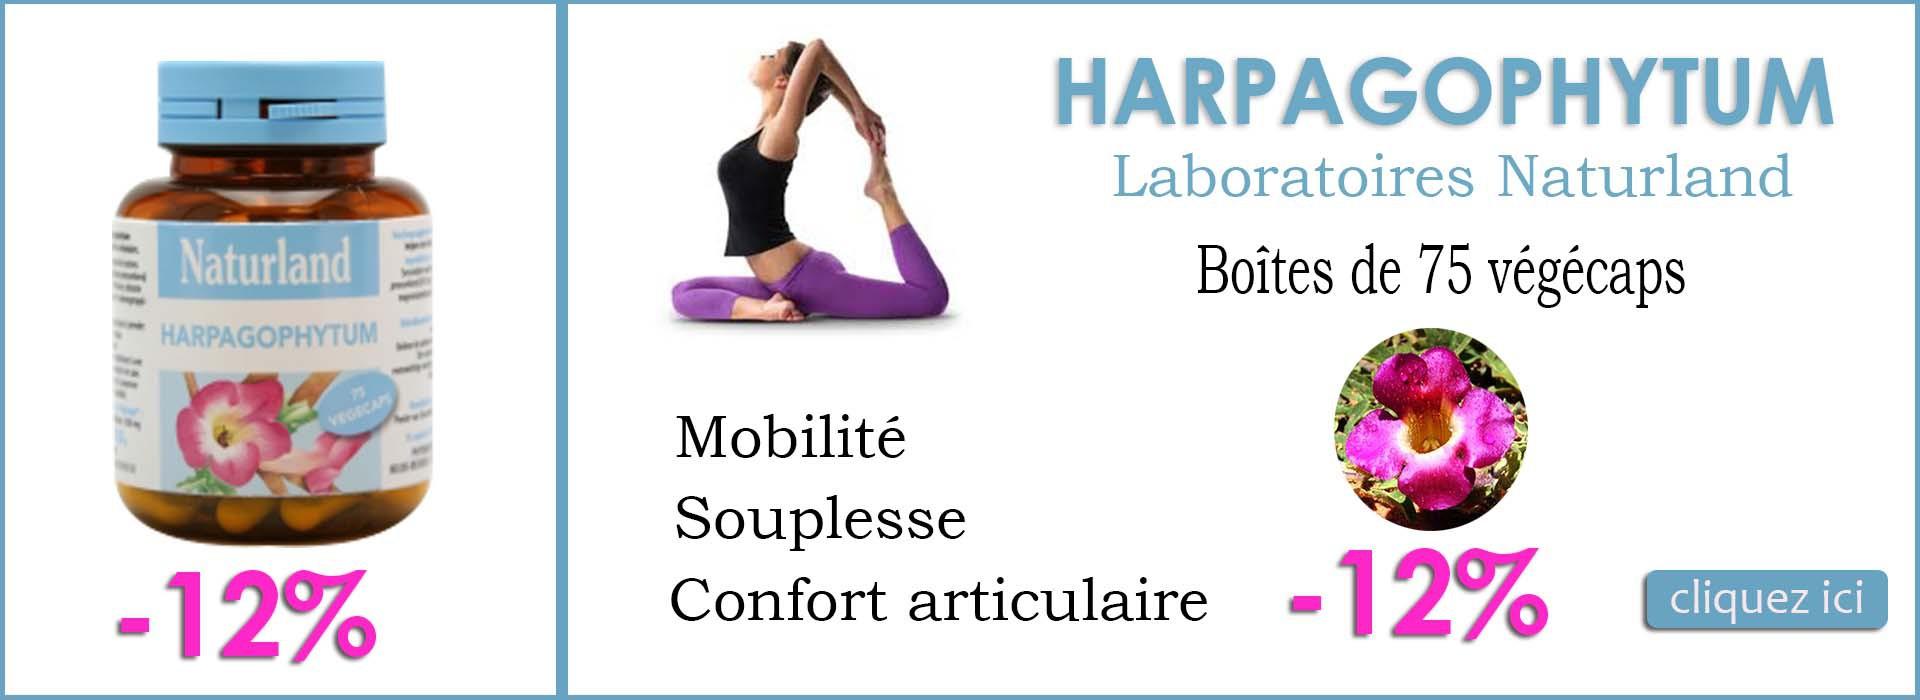 Articulations - Harpagophytum -12%